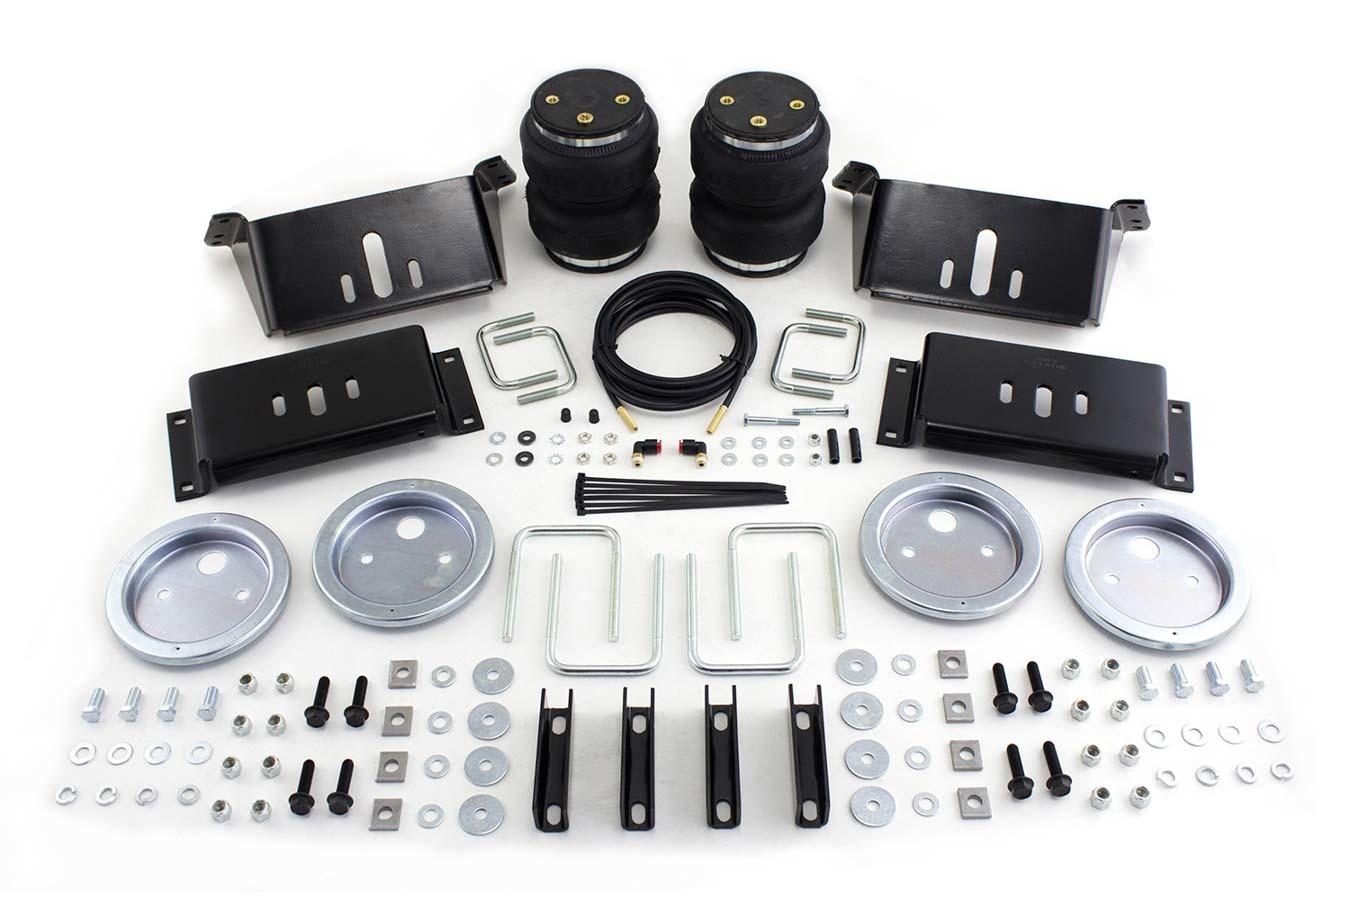 Air Lift 57215 Air Spring Kit, Loadlifter 5000, Bags / Brackets / Lines, 5000 lb Capacity, Black Powder Coat Brackets, Rear, Various Applications, Kit